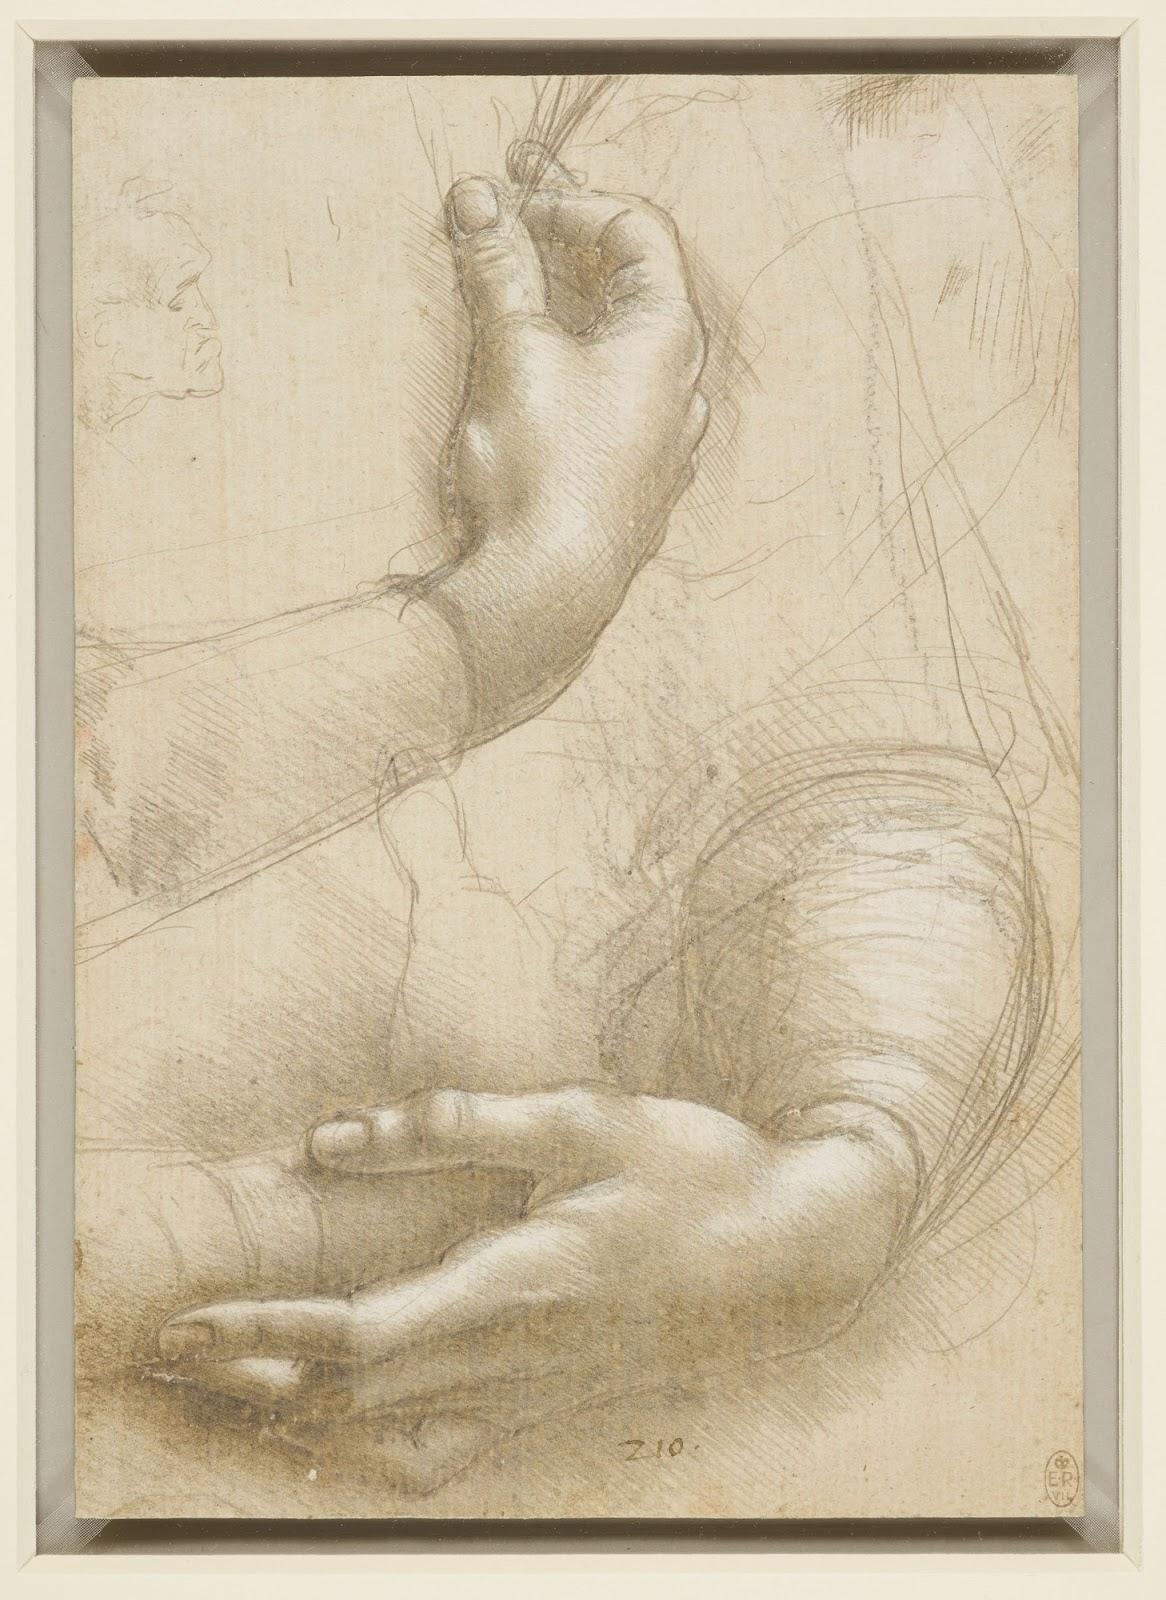 da Vinci, study of hands